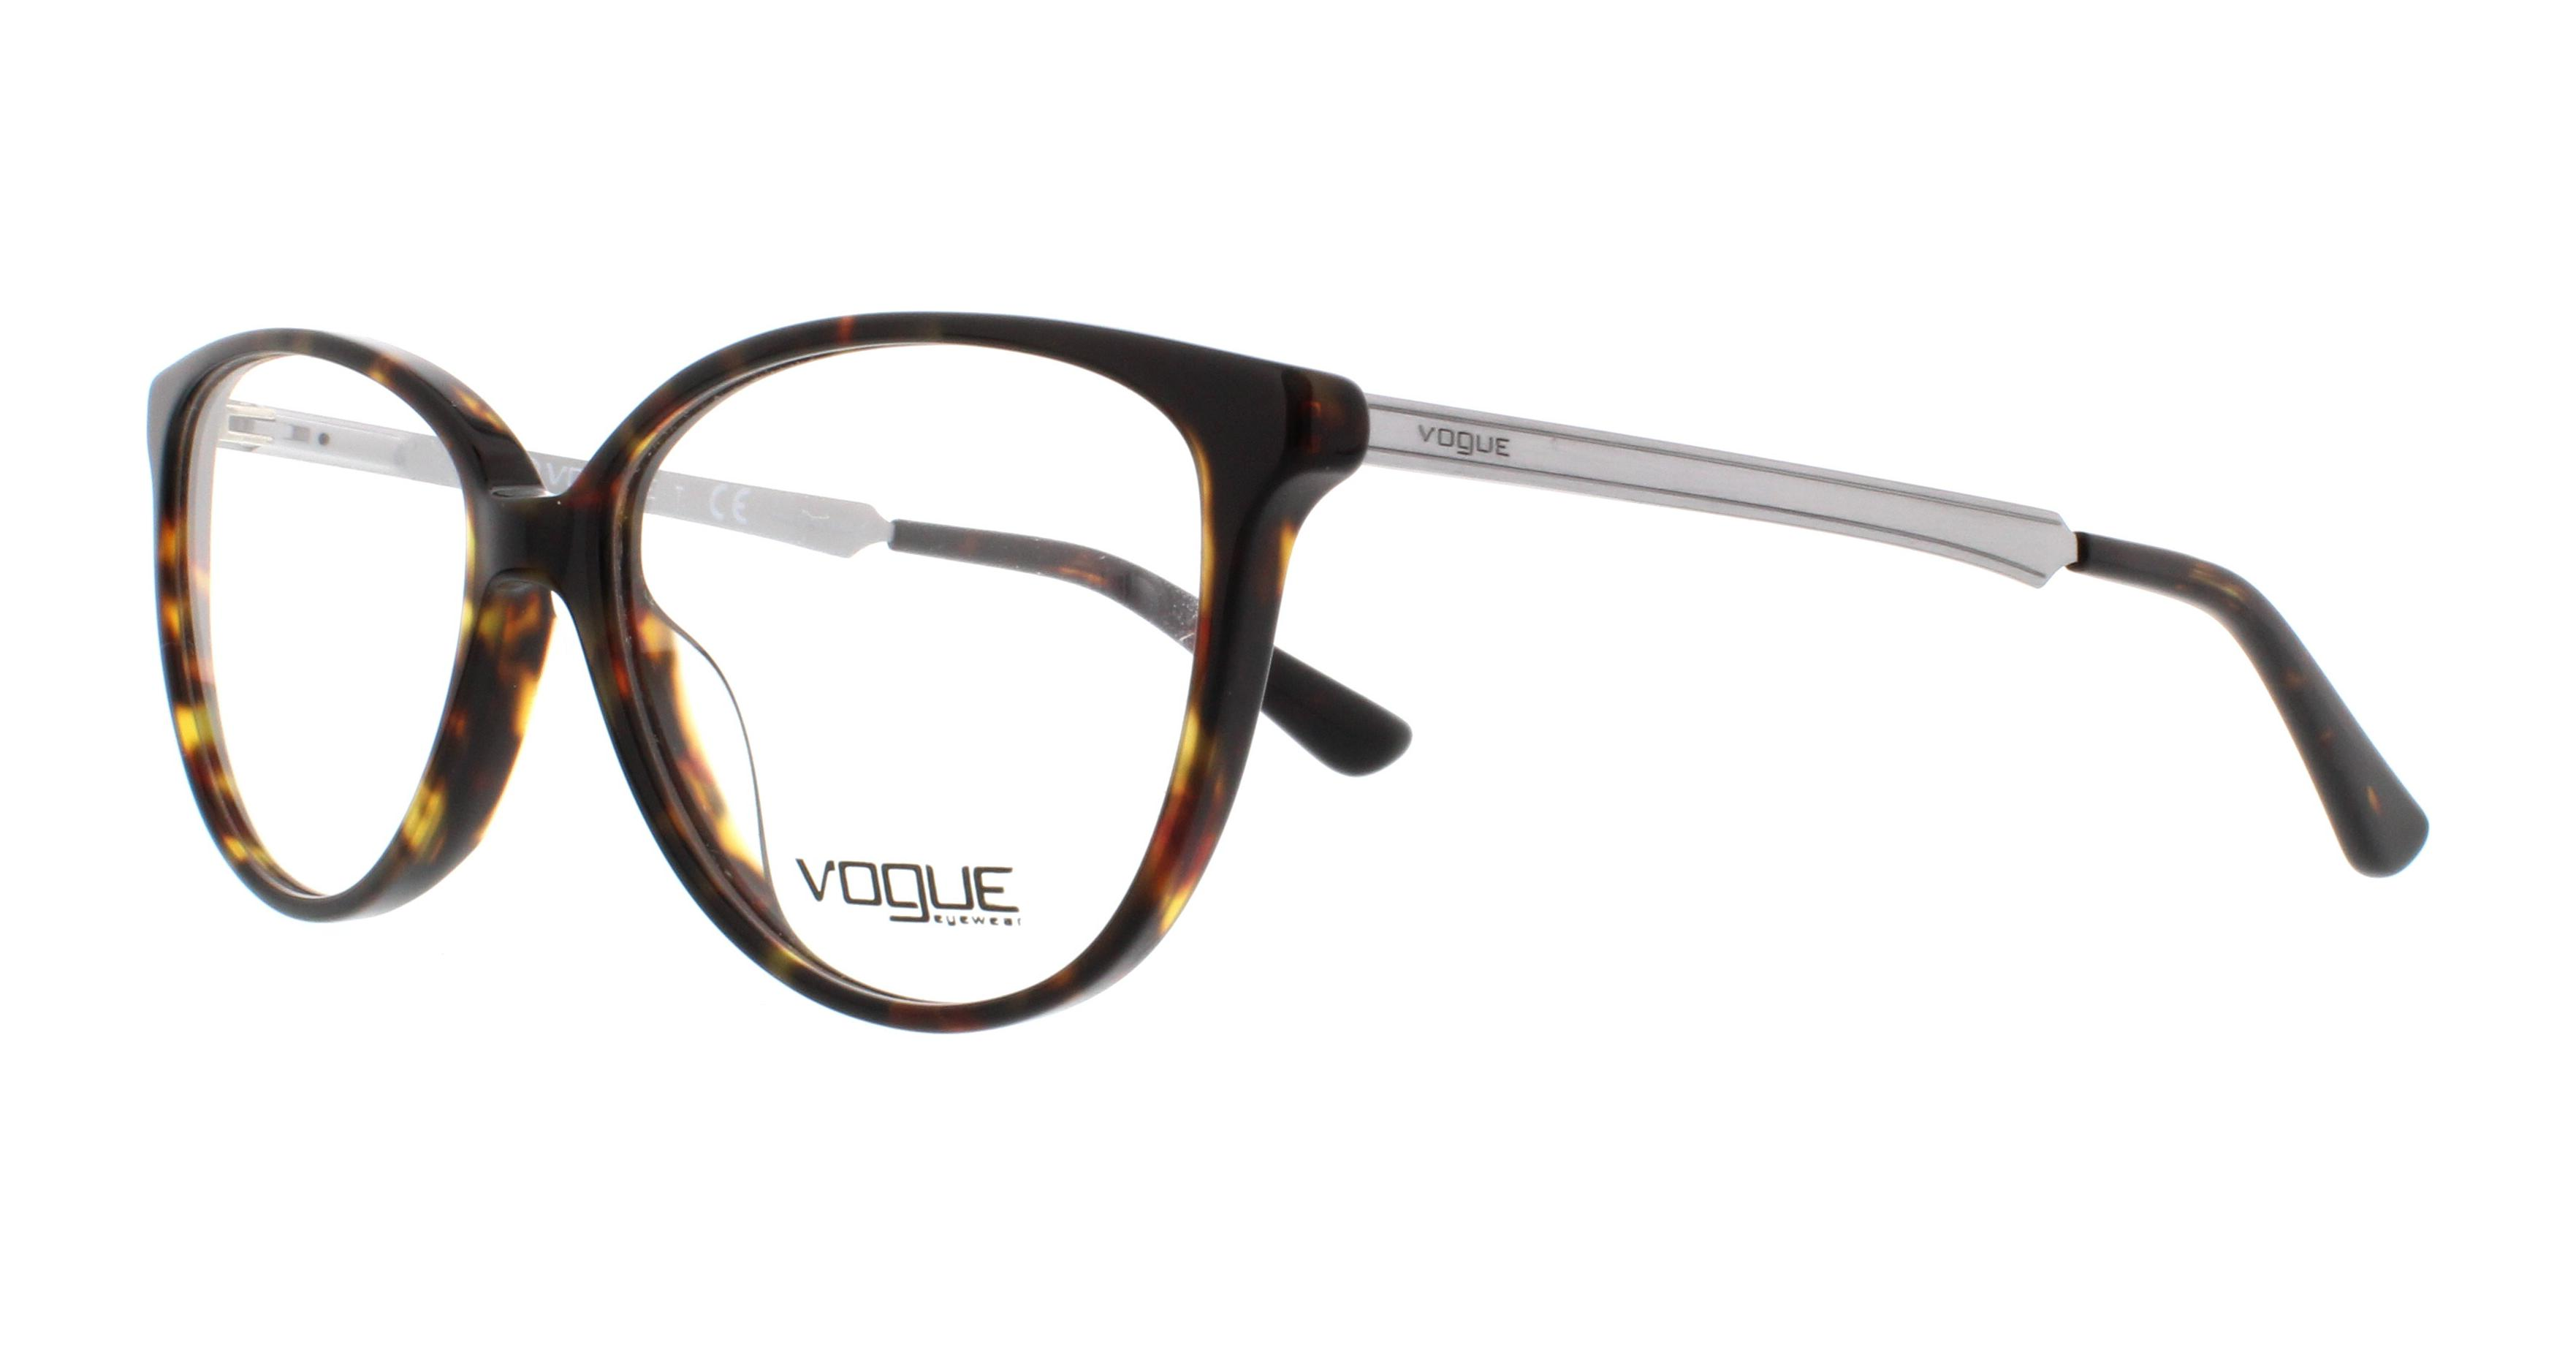 ef8e5b56533 Enchanting Vogue Eyeglass Frames For Women Composition - Frames ...